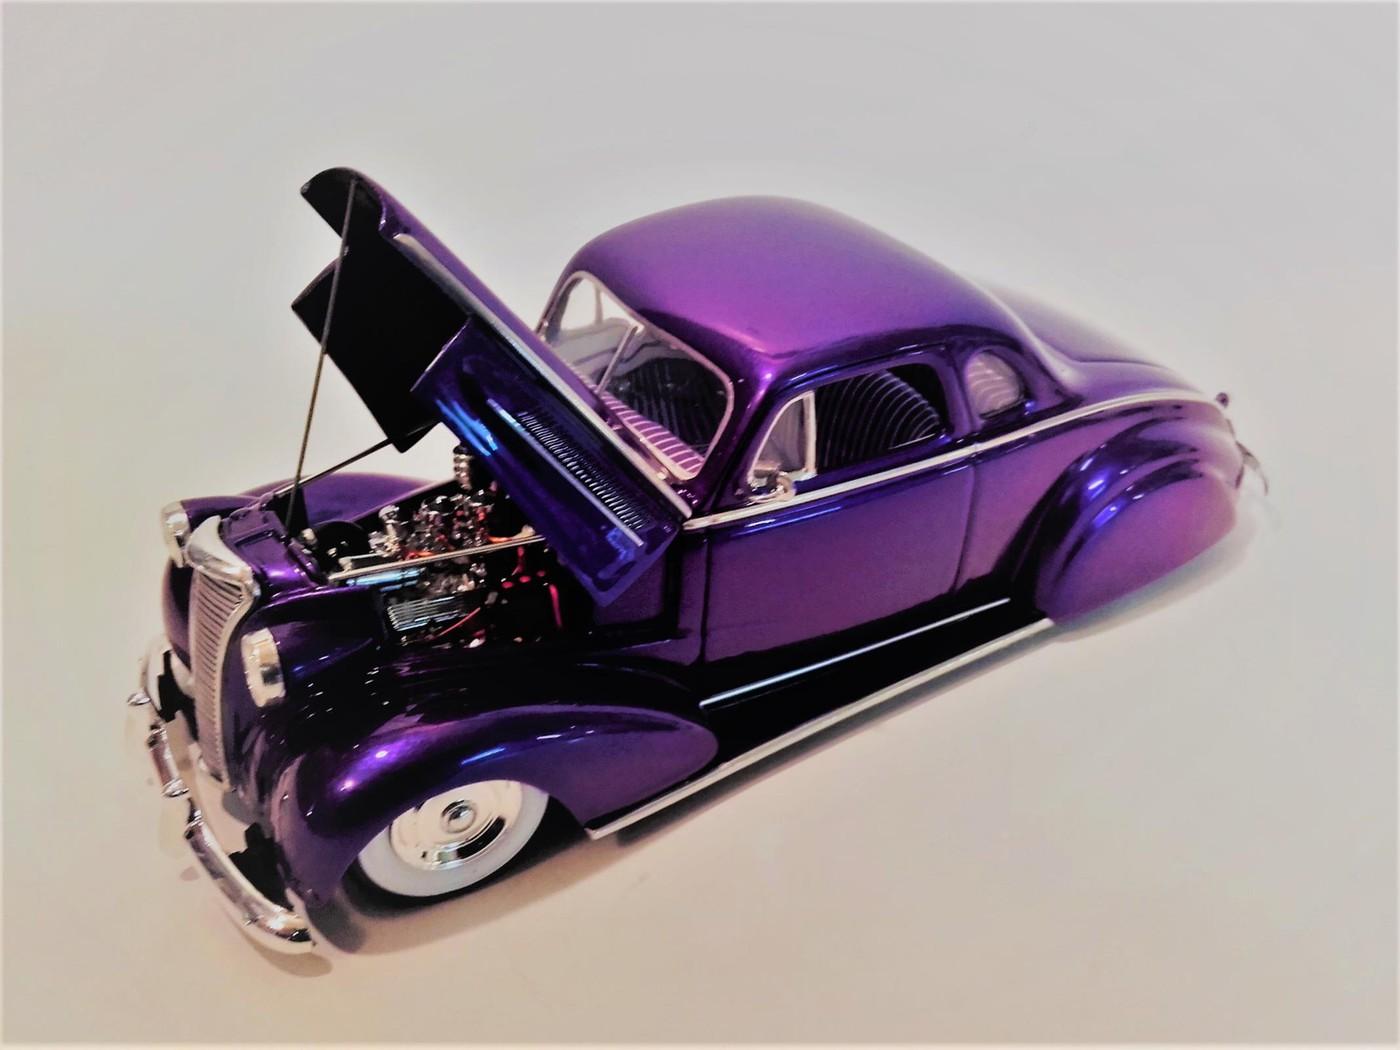 Projet Chevy 37 custom terminée  - Page 2 Photo24-vi